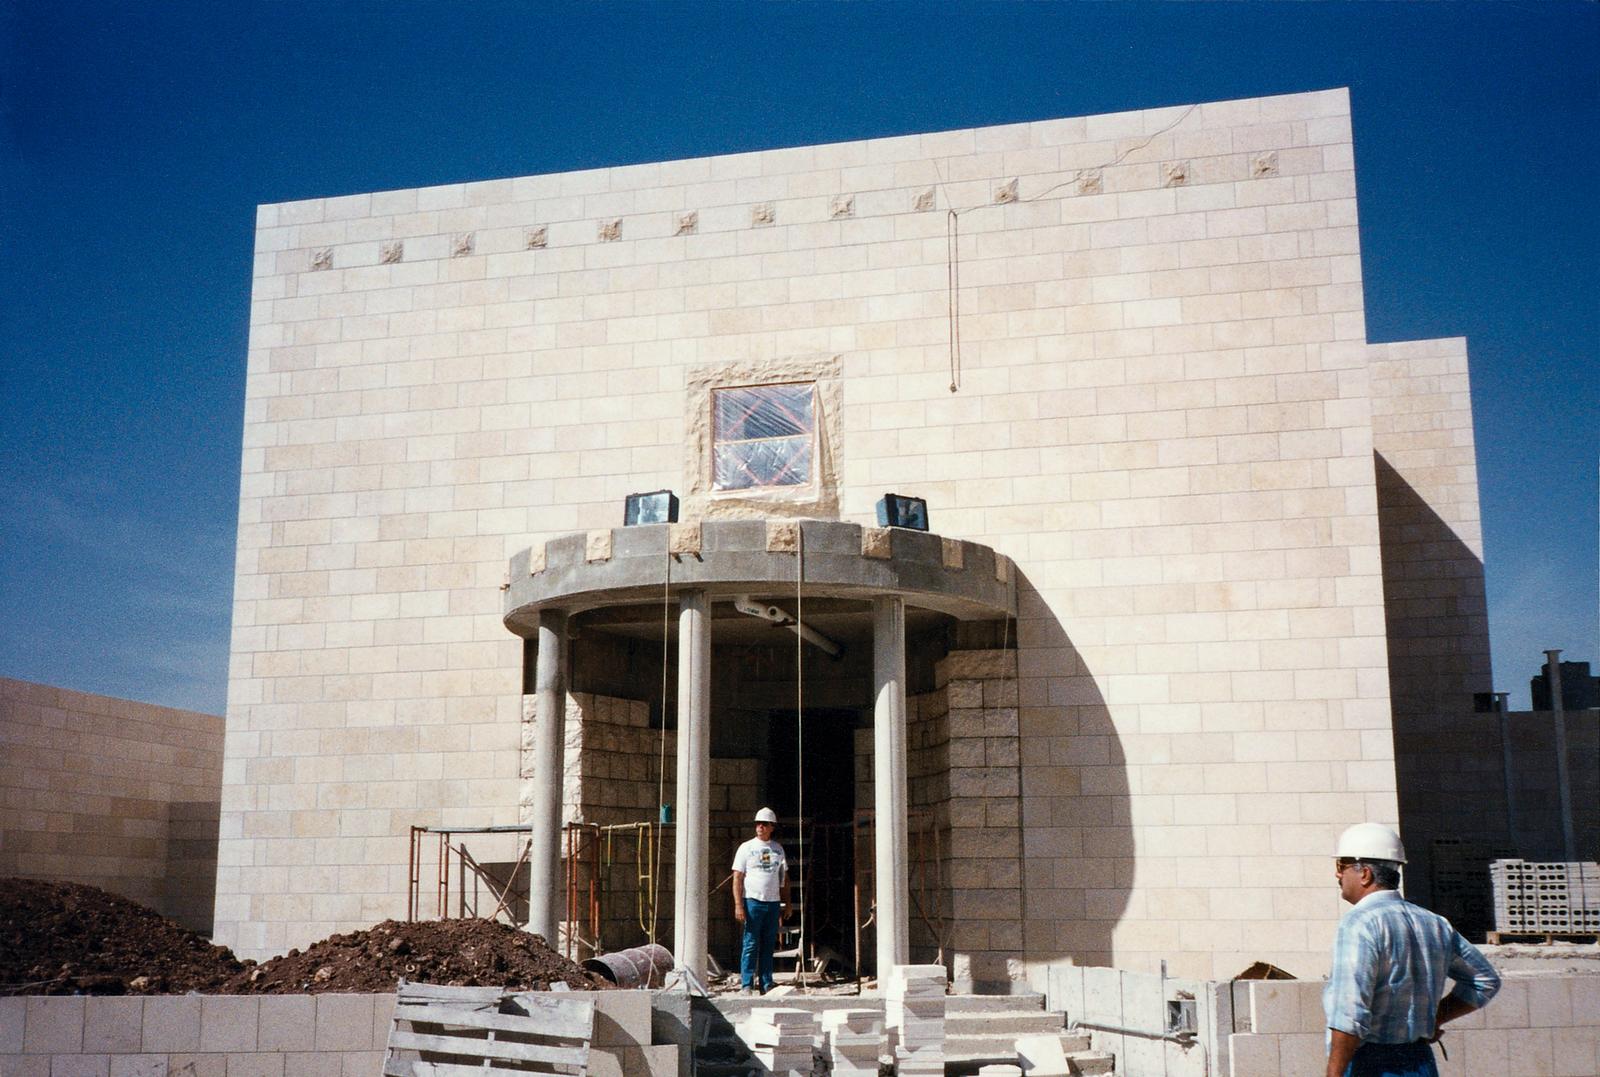 Amman - Chancery Office Building - 1990